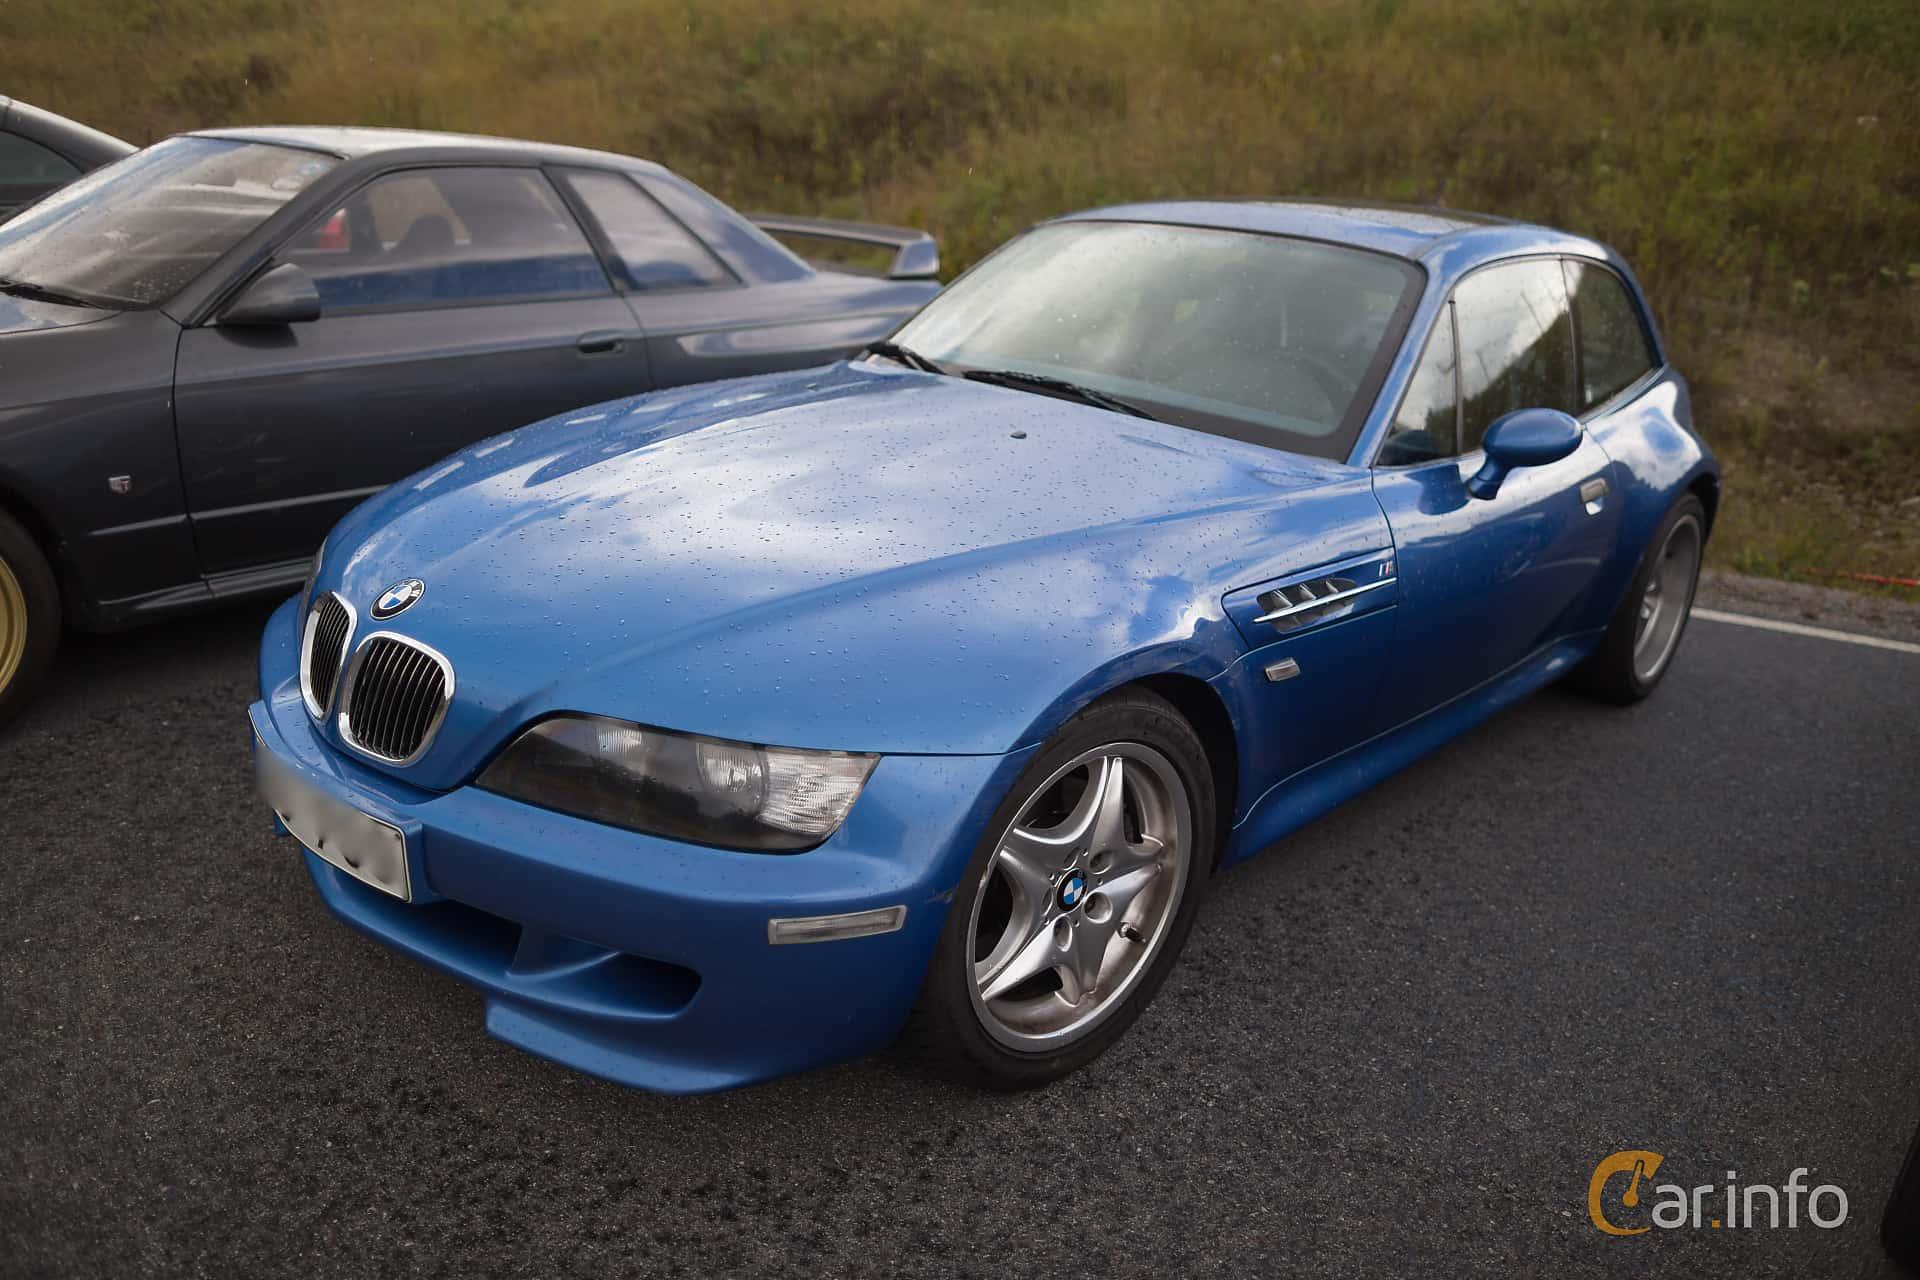 bmw-z3-coupe-front-side-arlanda-bilfestival-2014-1-33135.jpg